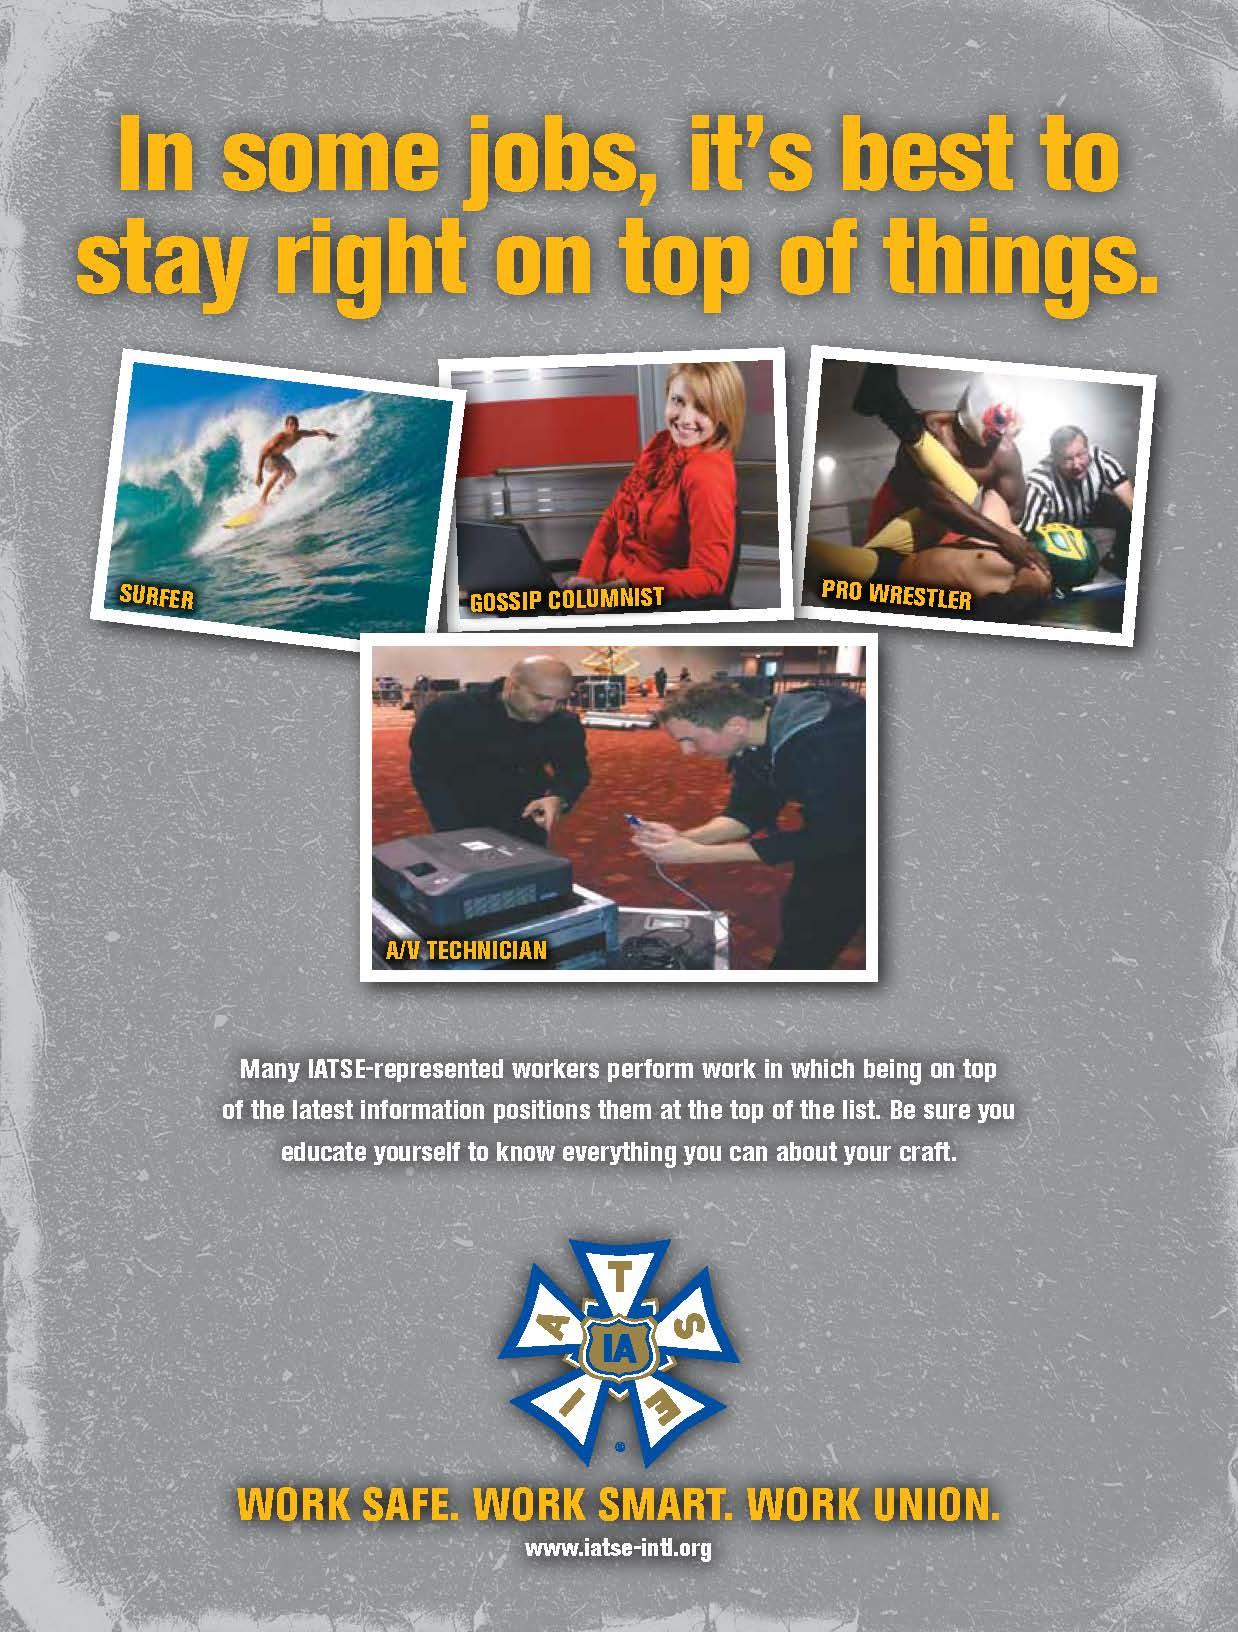 Promoting Workplace Safety | IATSE Studio Mechanics Local 489